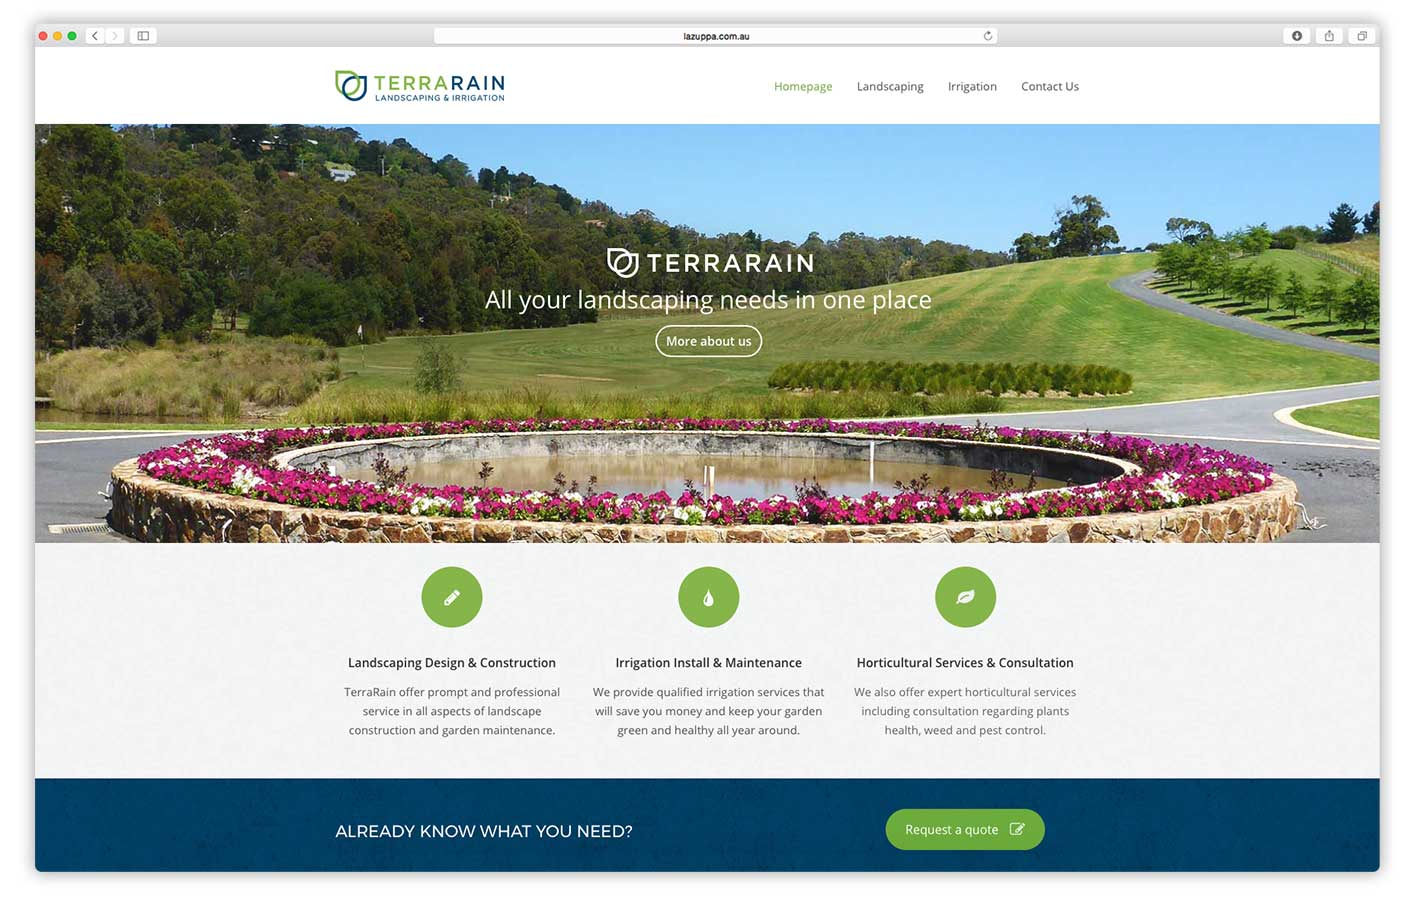 TerraRain-website_pages1.jpg